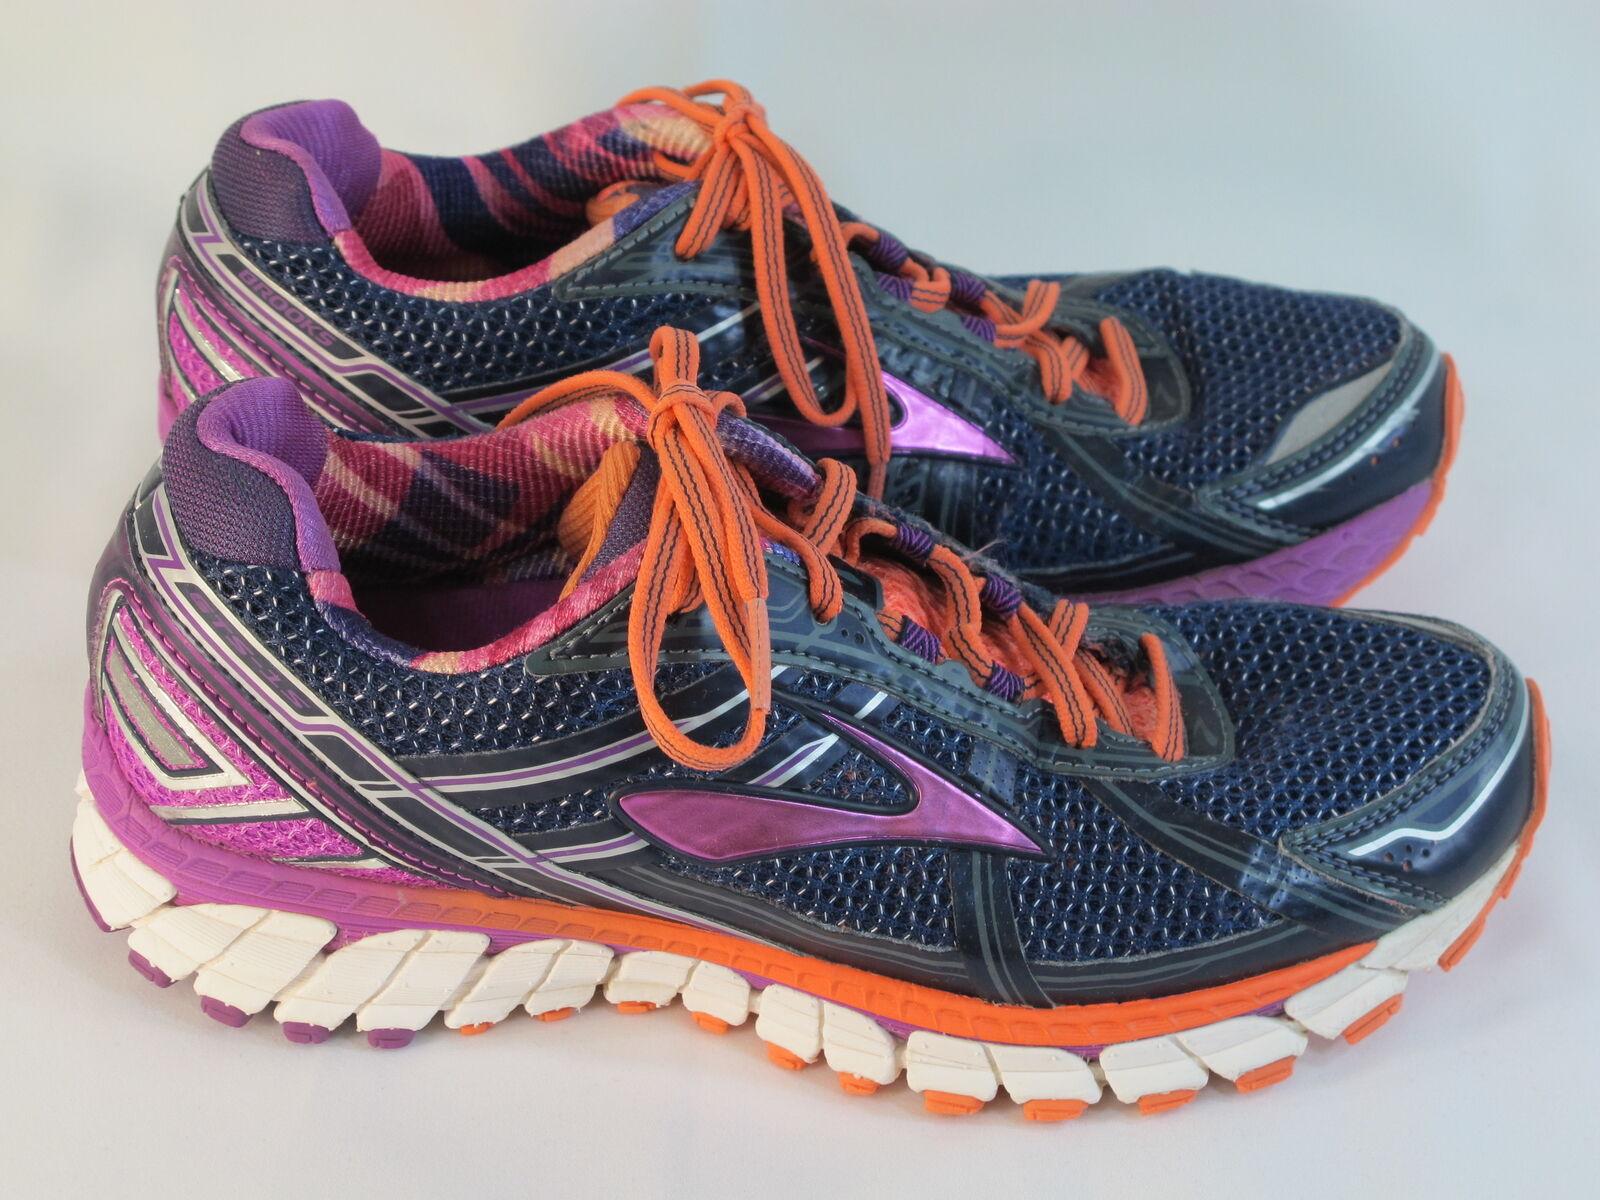 Brooks Adrenaline GTS 15 Running Shoes Women's Size 9 B US Excellent Plus